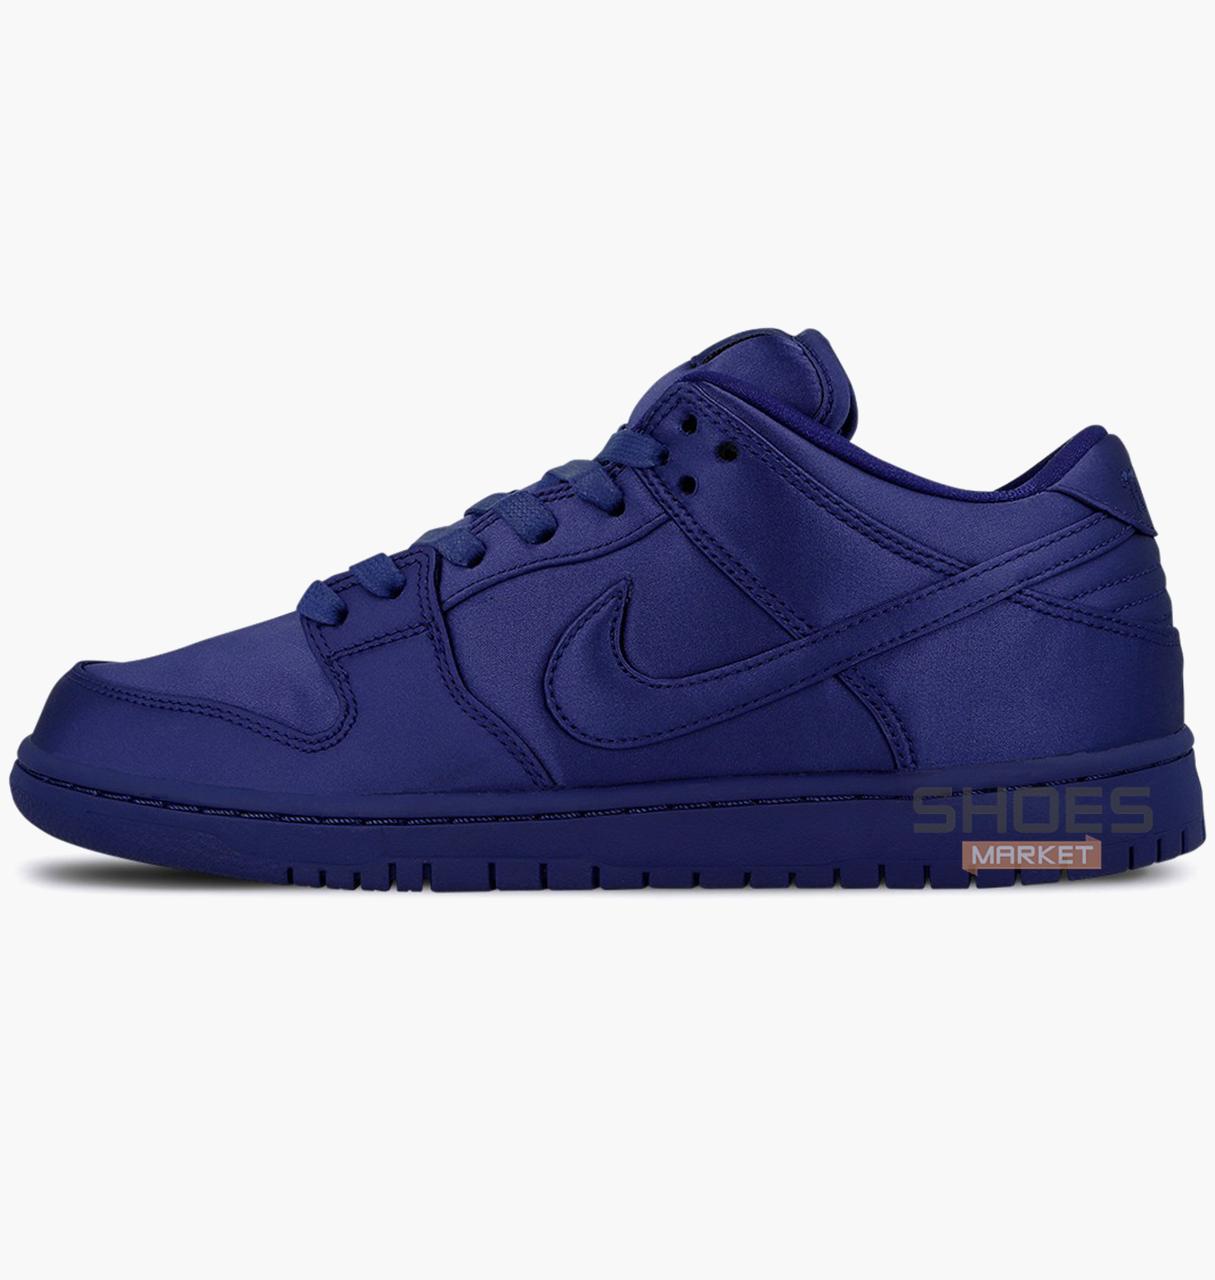 4c92d1aa Мужские кроссовки Nike SB X NBA Dunk Low TRD